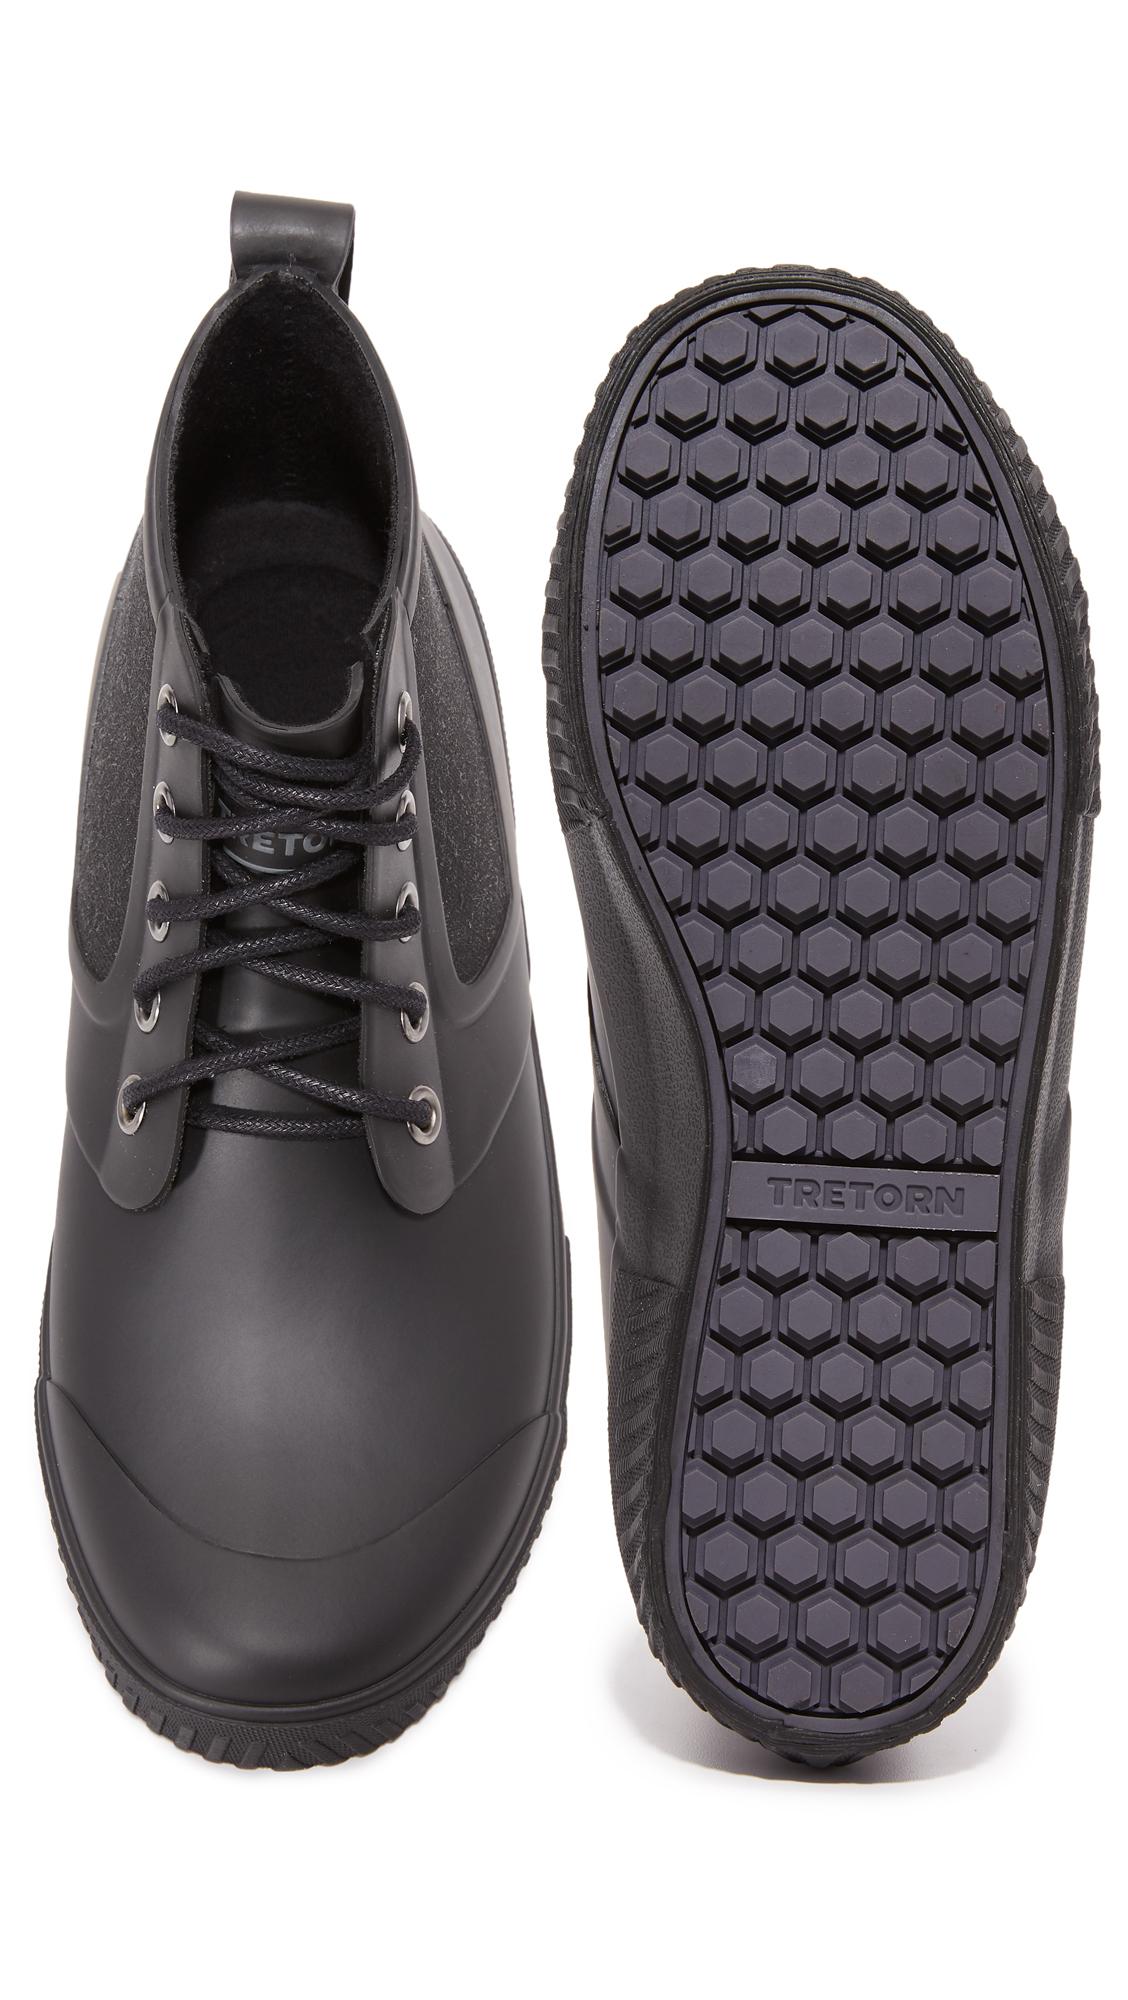 Tretorn Rubber Gill Boots In Black For Men Lyst